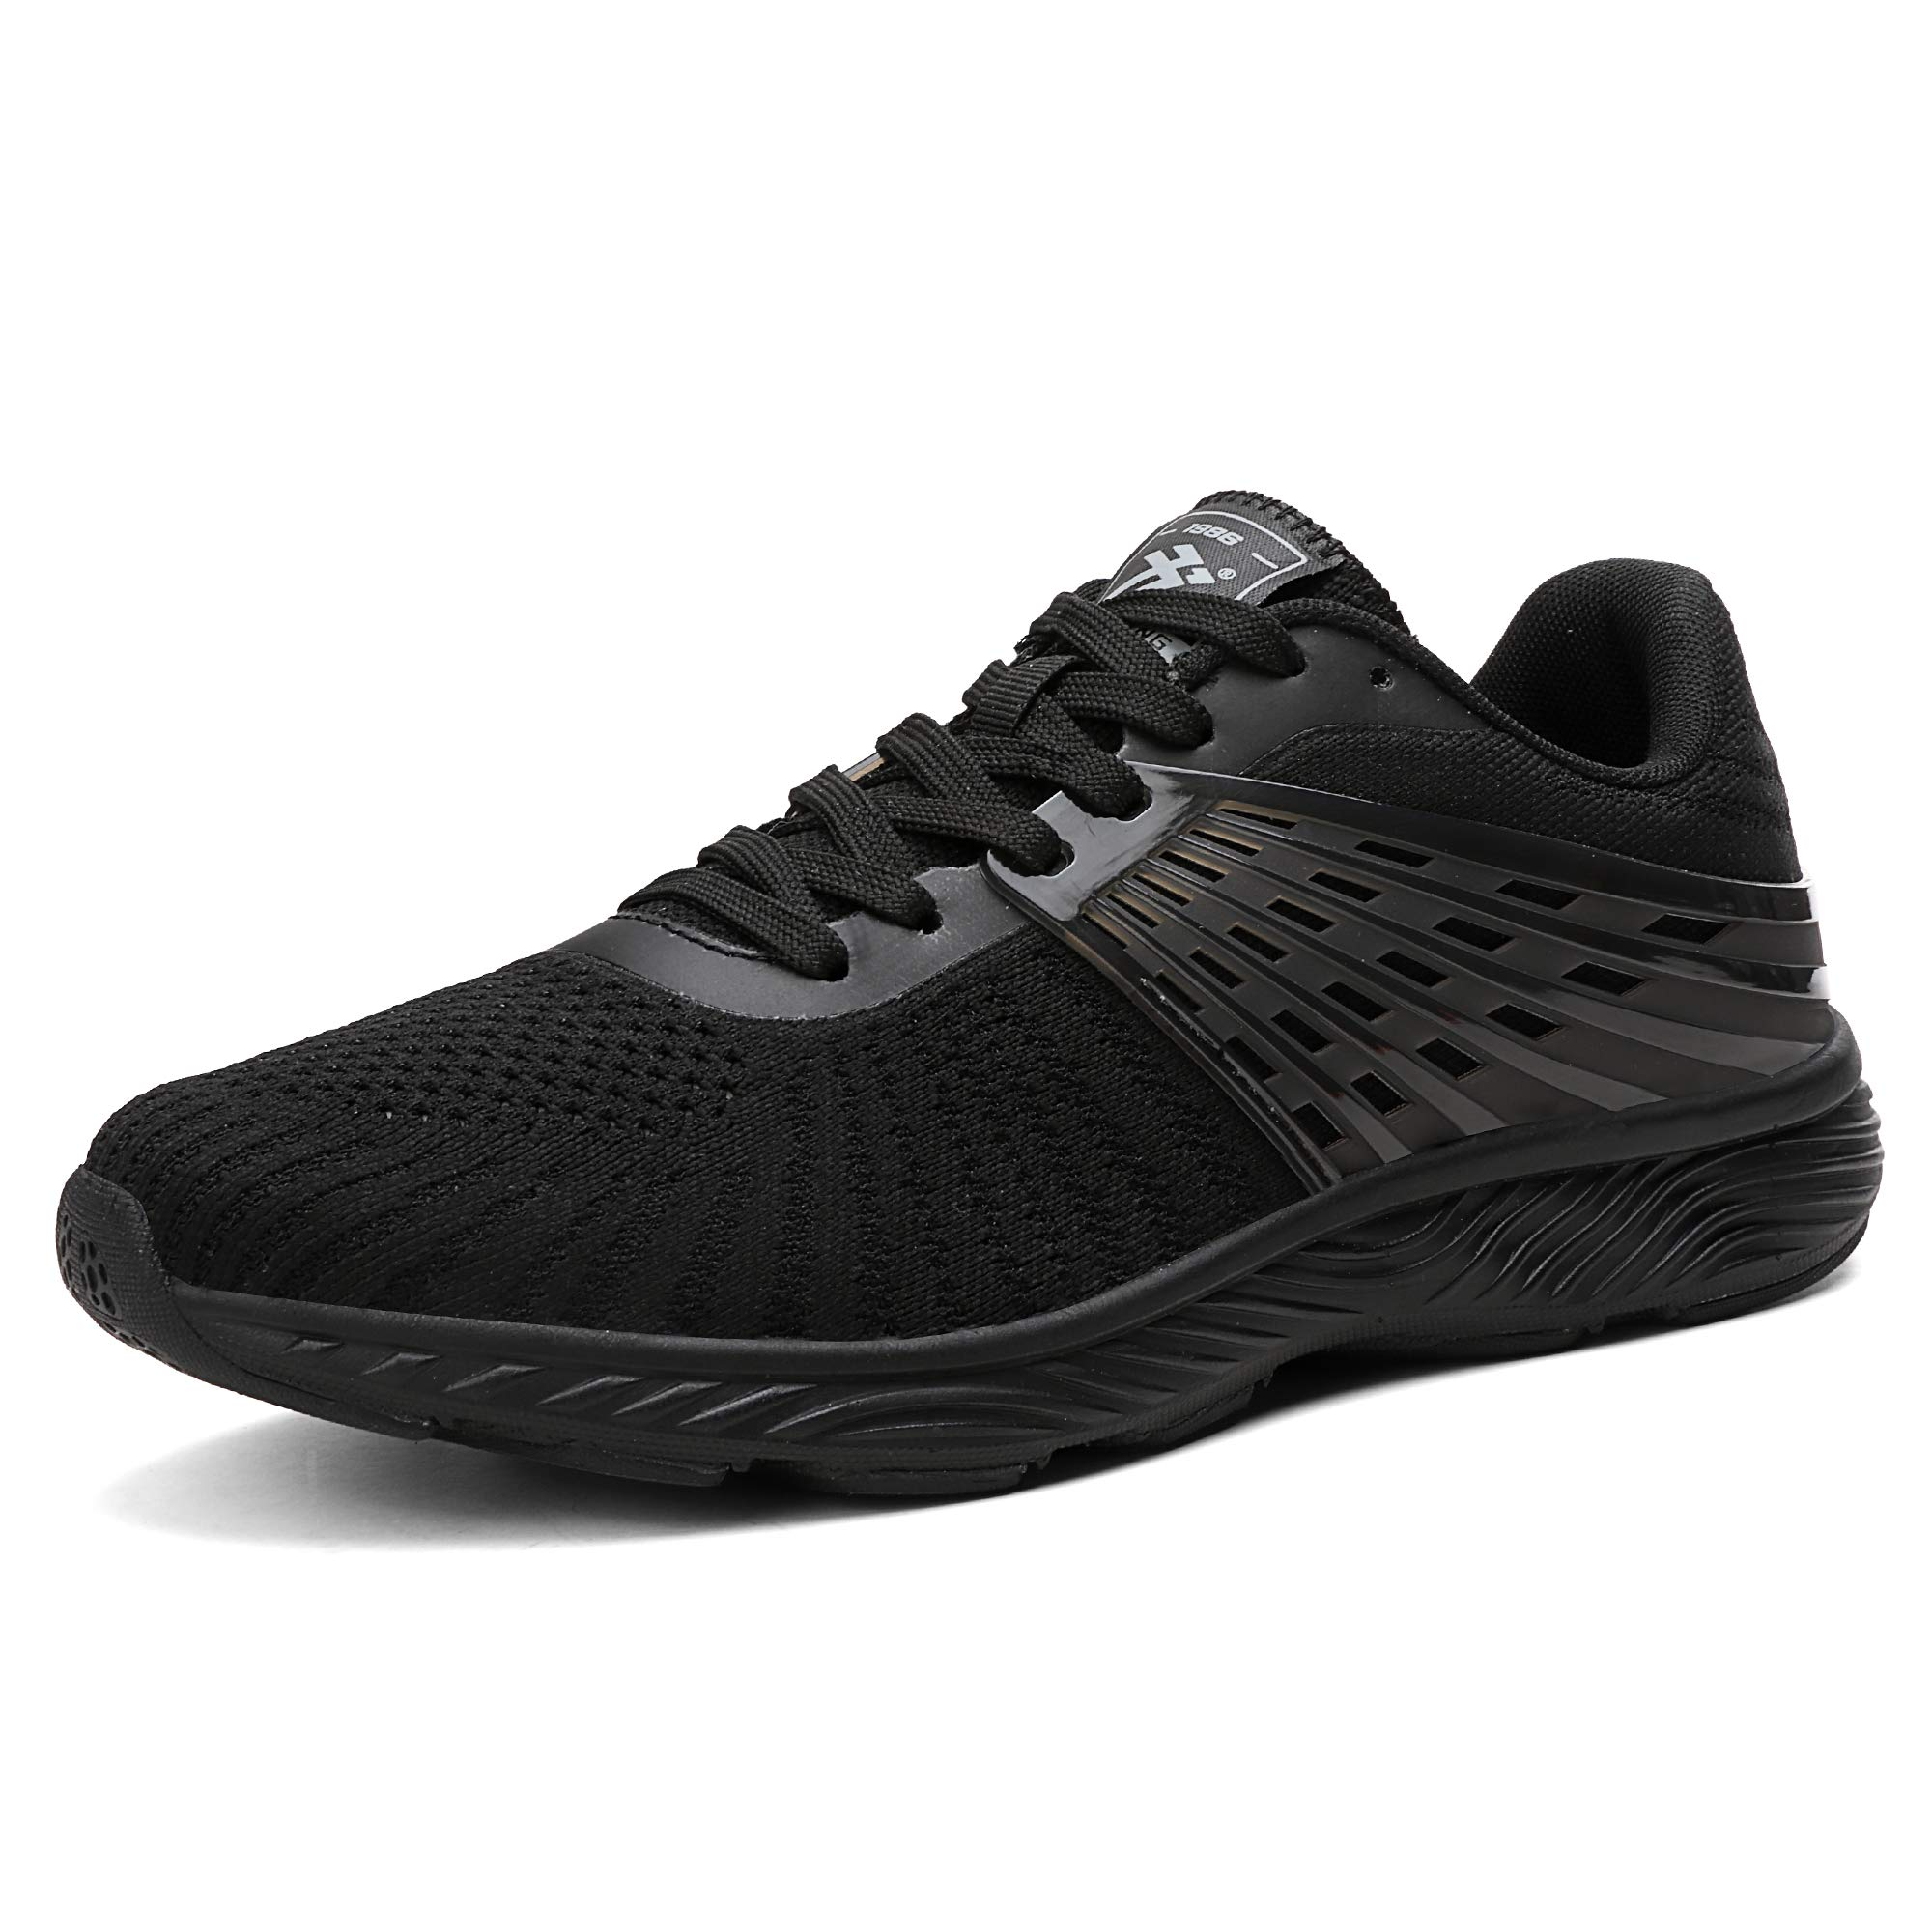 4a01c263bd4 AX BOXING Zapatillas Hombres Deporte Running Sneakers Zapatos para Correr  Gimnasio Deportivas Padel Transpirables Casual 40